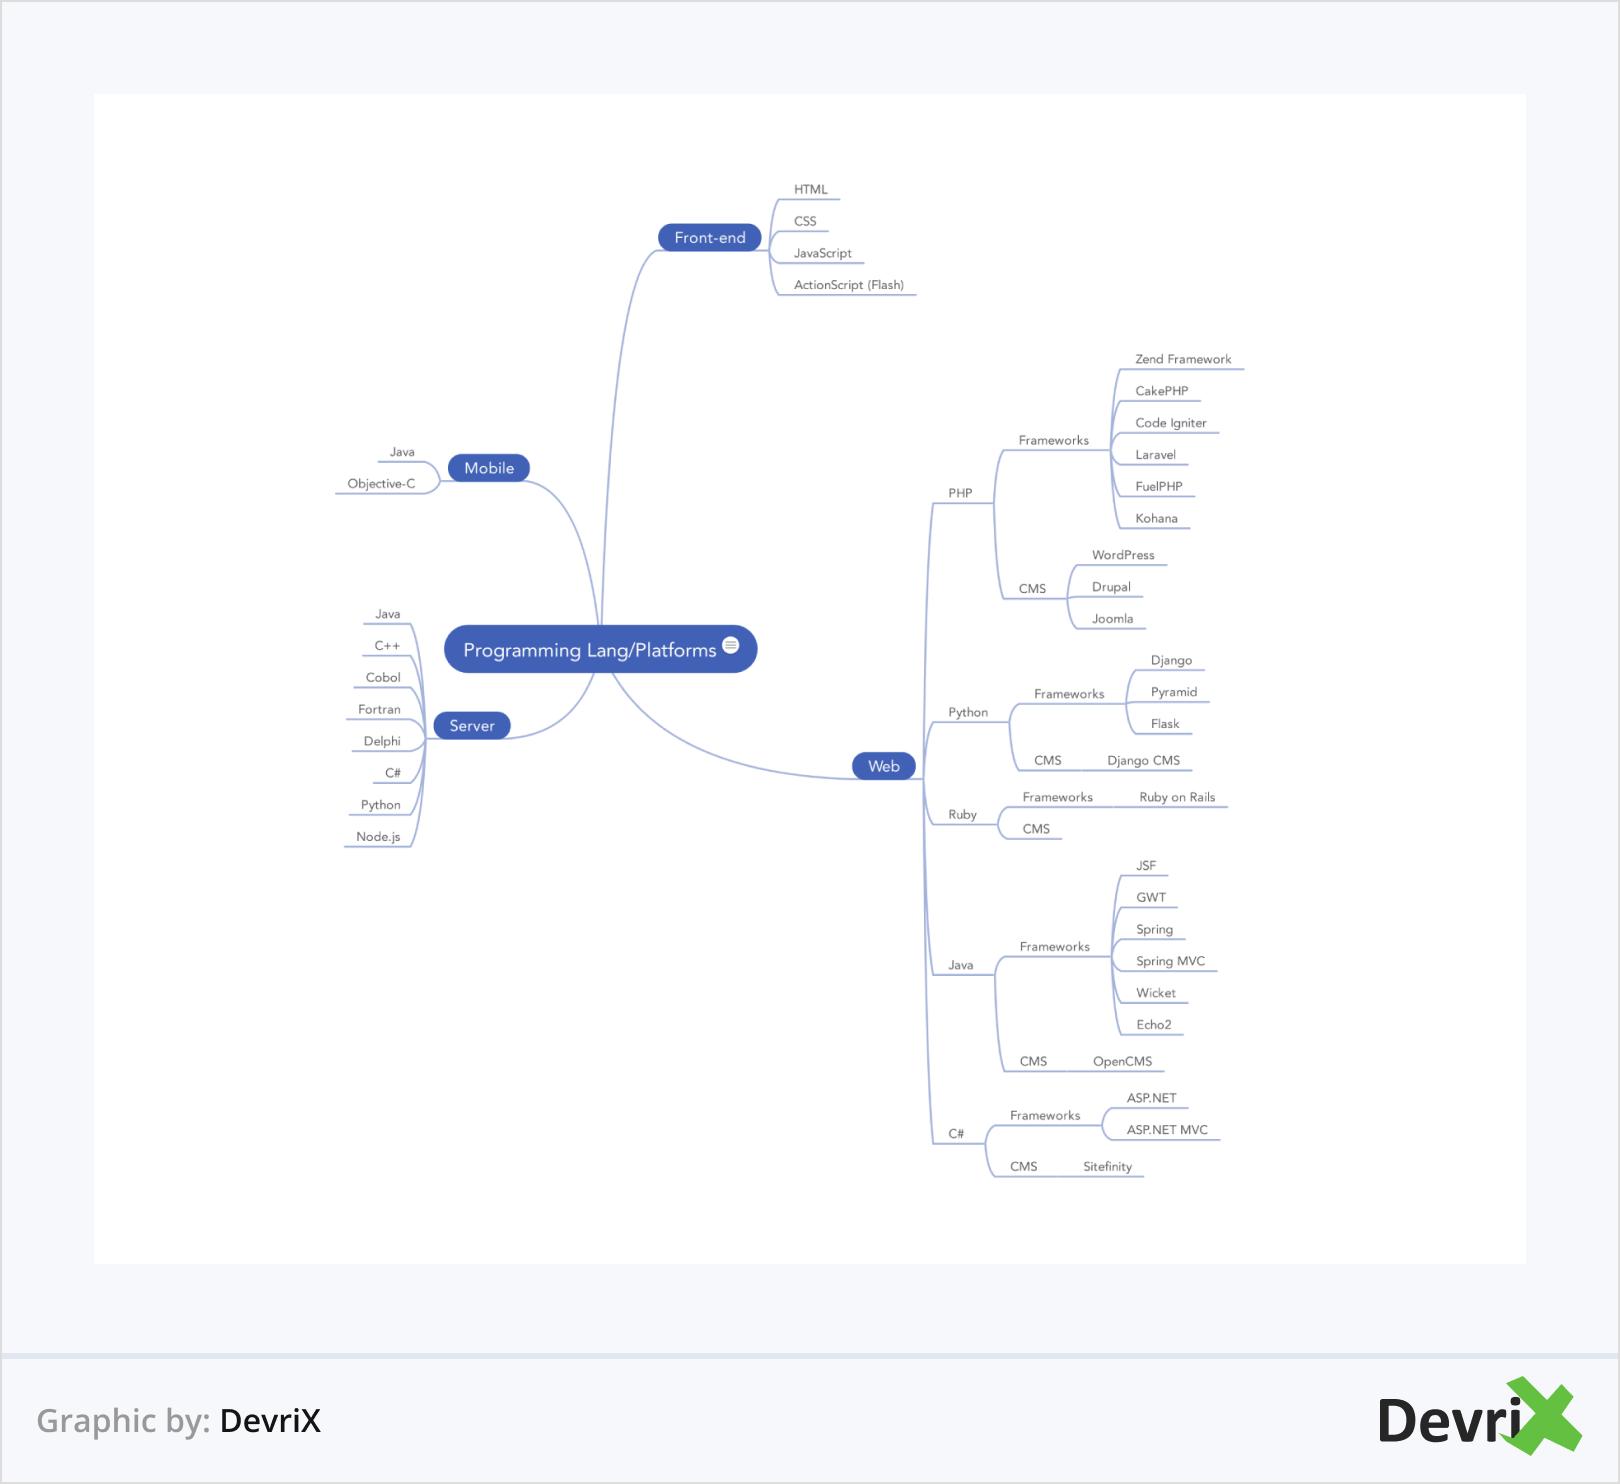 Programming Lang and Platforms